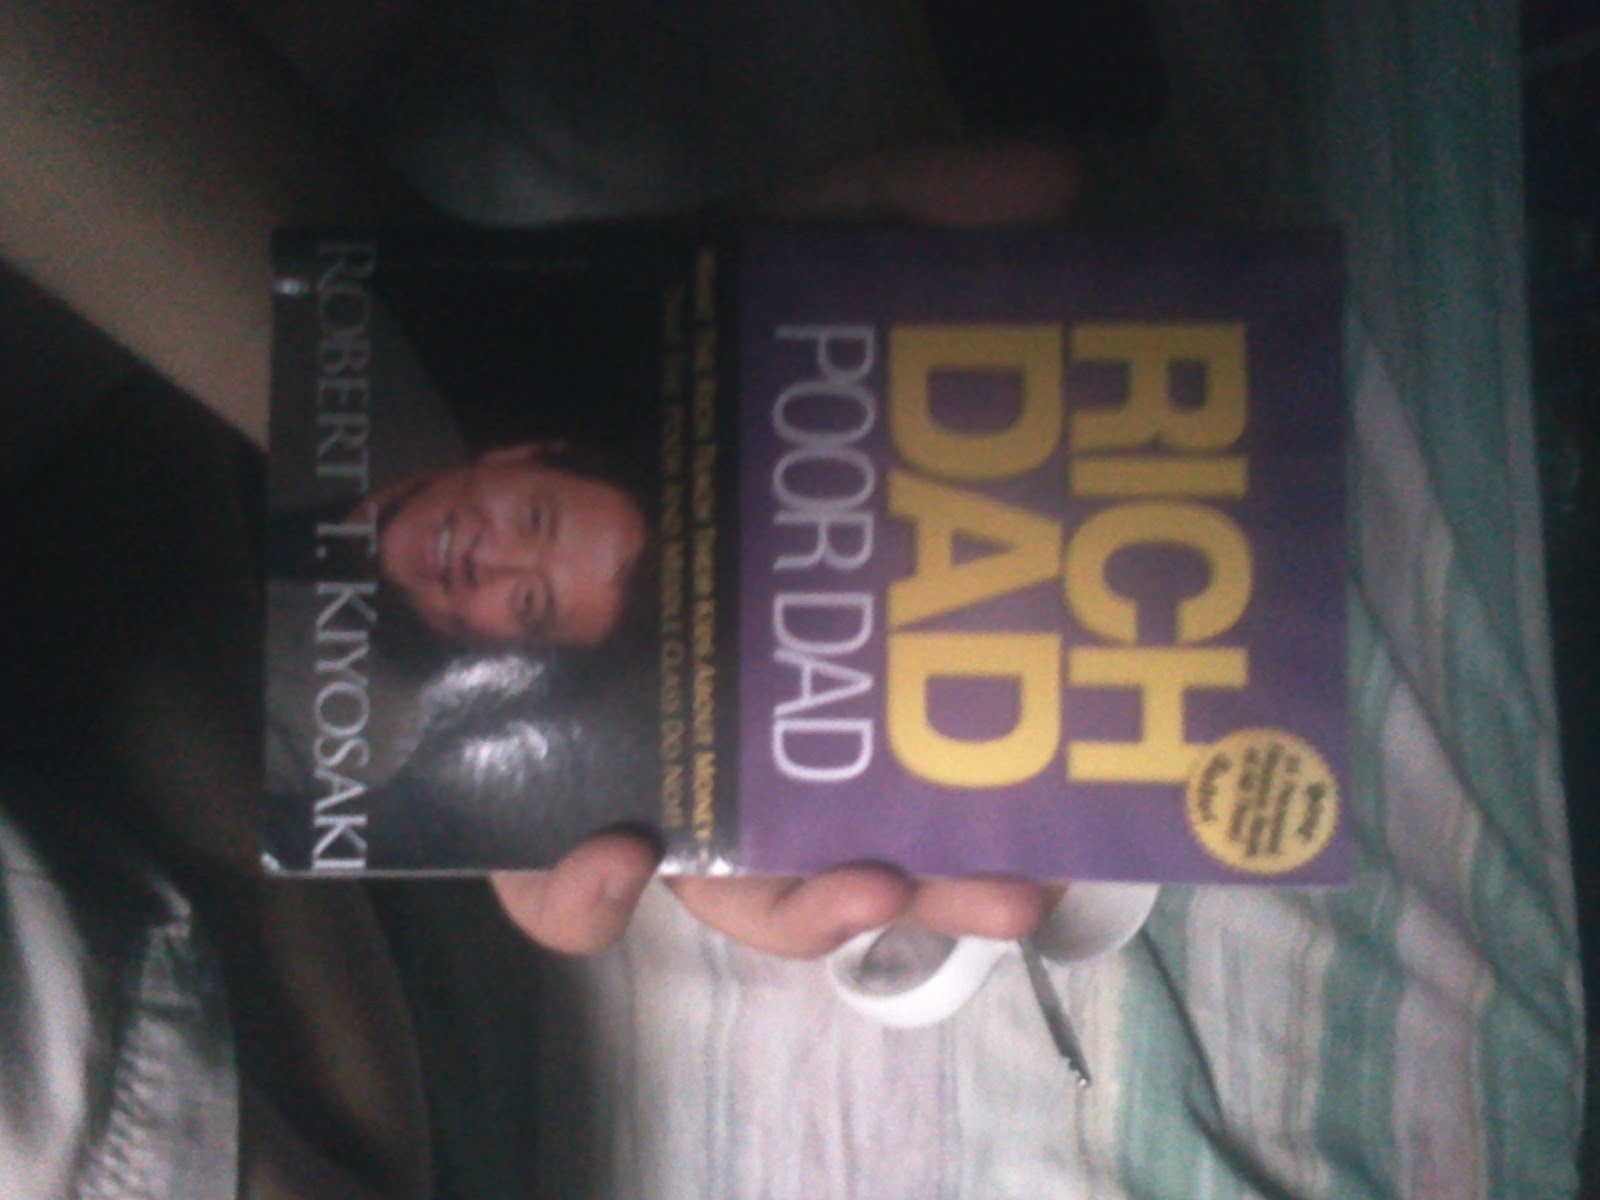 2011 book review rich dad poor dad by robert t kiyosaki